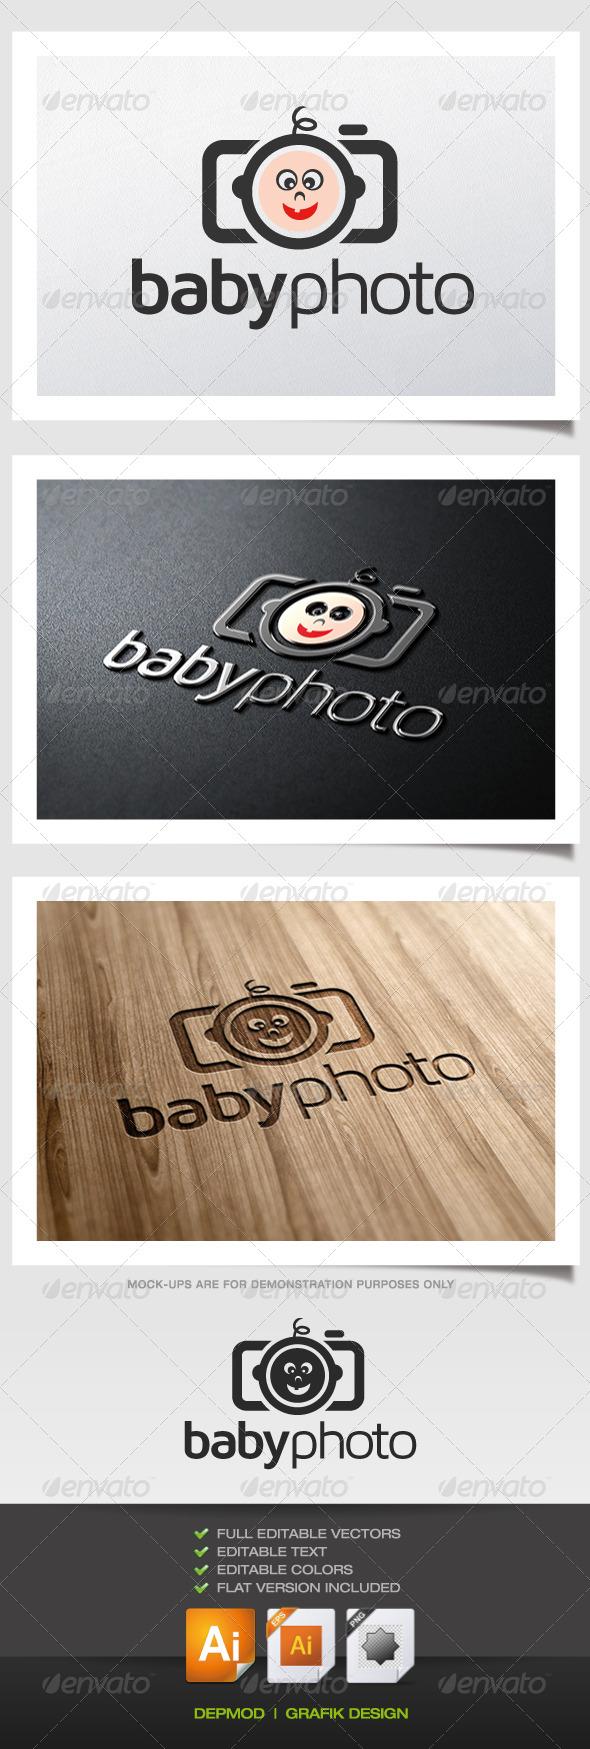 GraphicRiver Baby Photo Logo 5365476